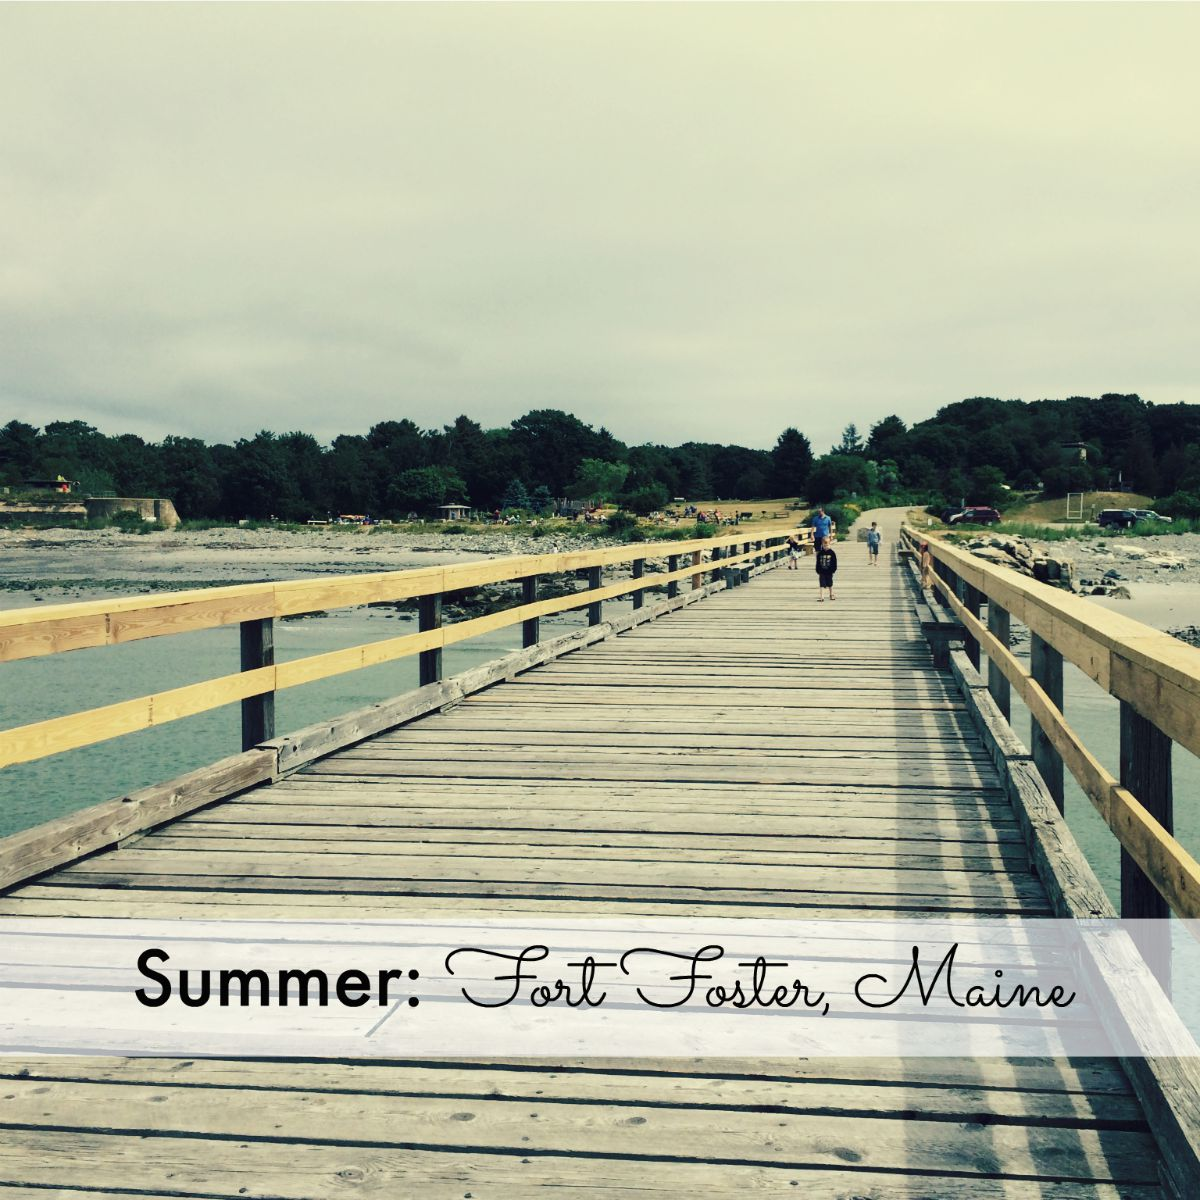 Summer: Fort Foster, Maine